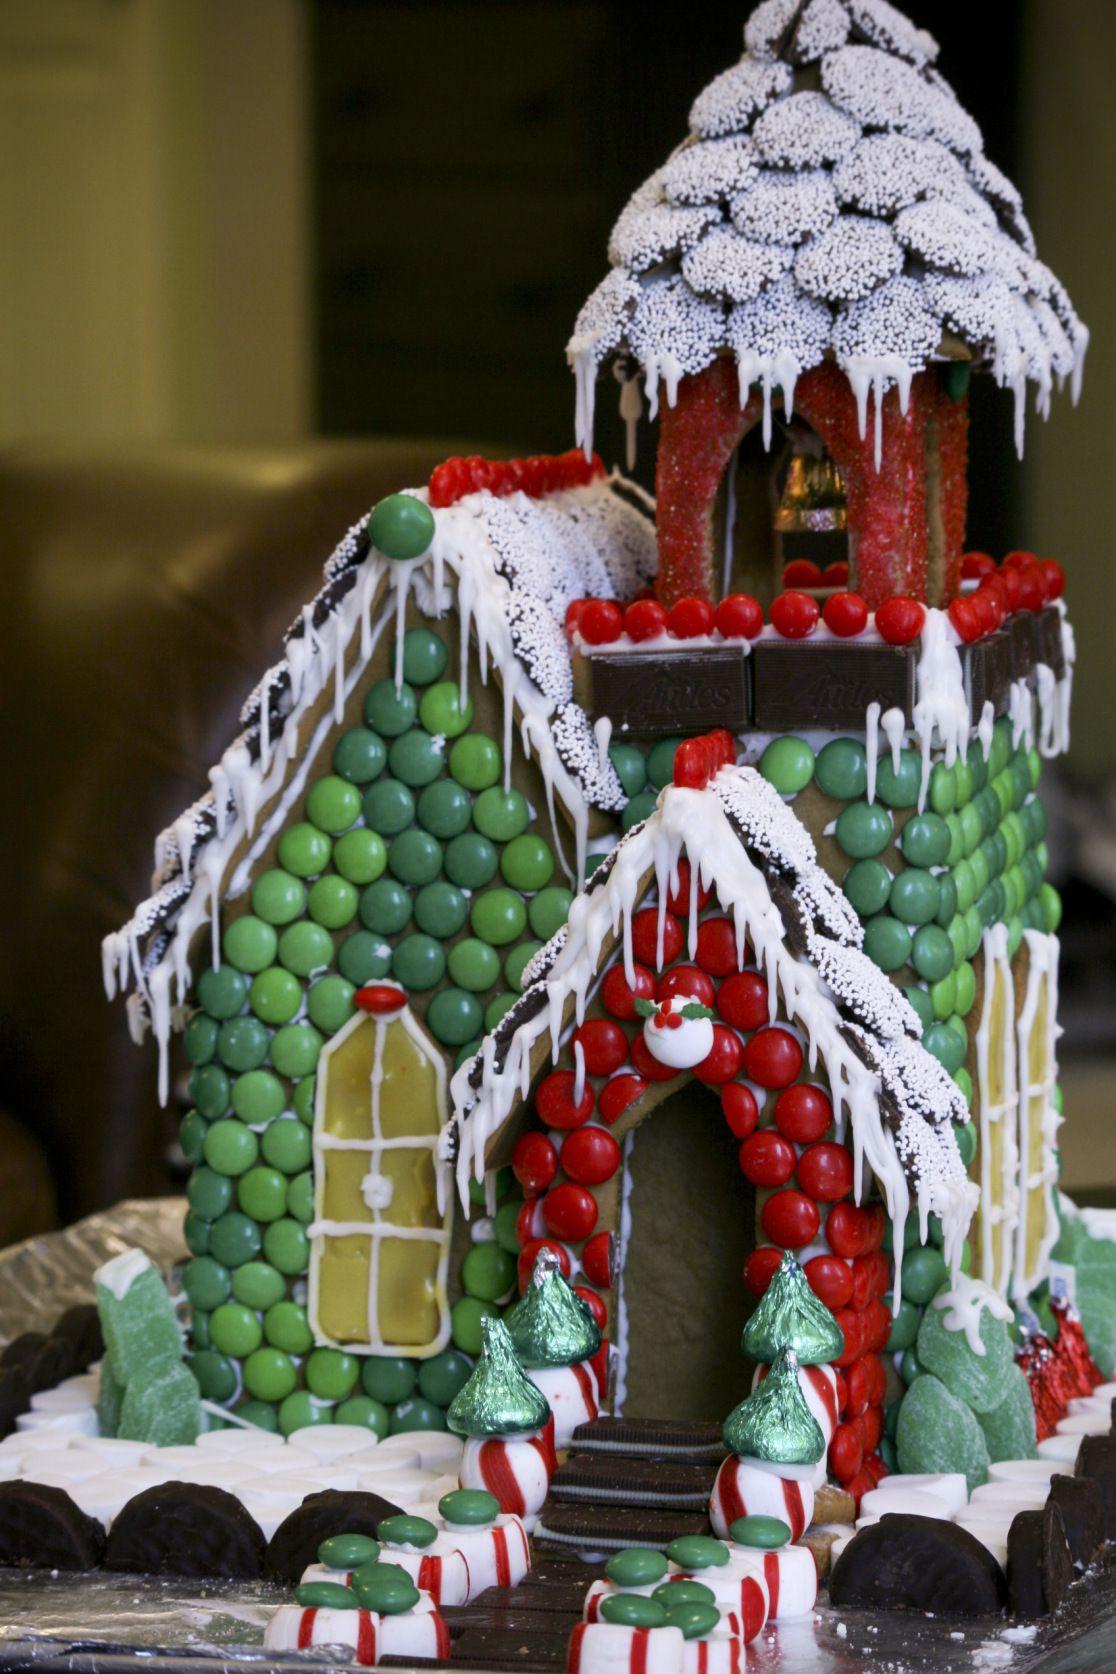 Gingerbread Church | Gingerbread House Ideas | Pinterest ... on church cakes, church family house, church snow, church autumn, church candy, church cupcakes, church country gingerbread recipe,